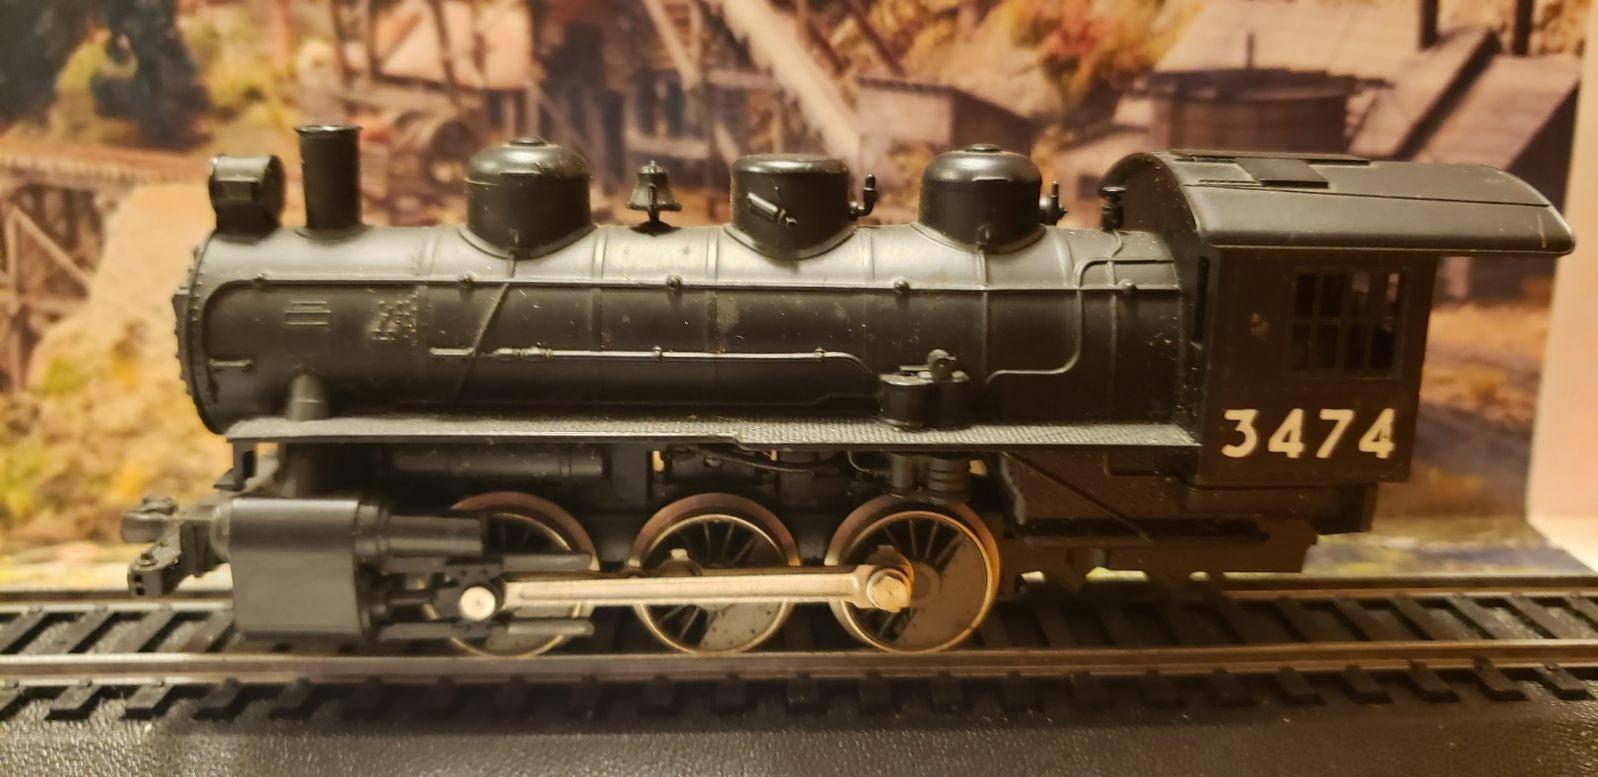 Rivarossi Steam Locomotive